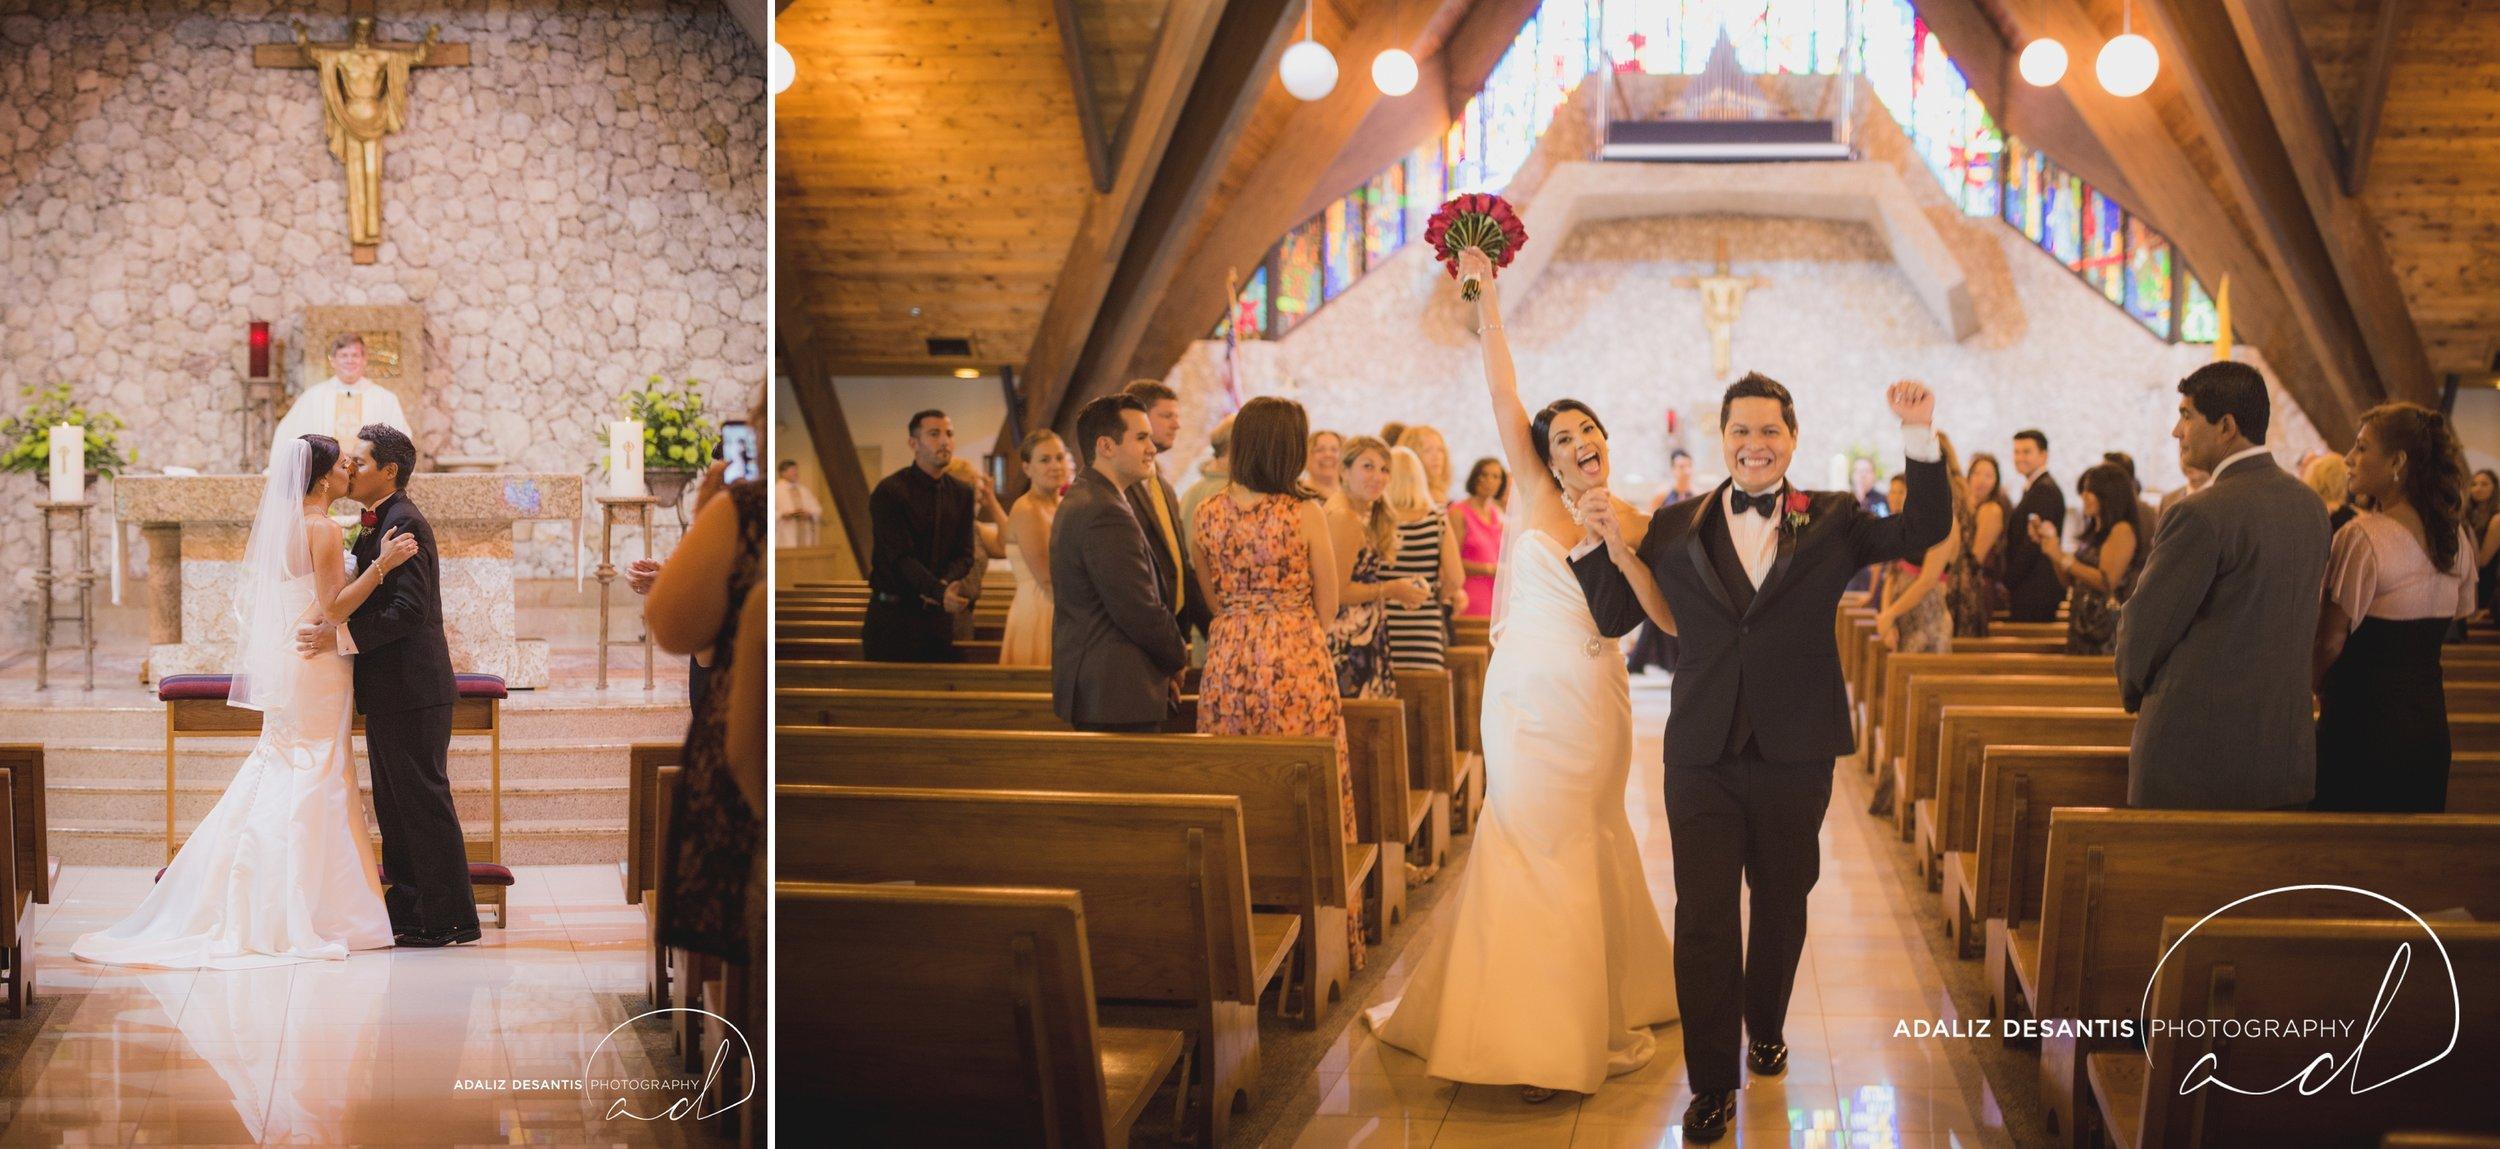 grande oaks golf club davie wedding saint david catholic church black red white south florida wedding photographer documentary photojournalistic 16.jpg